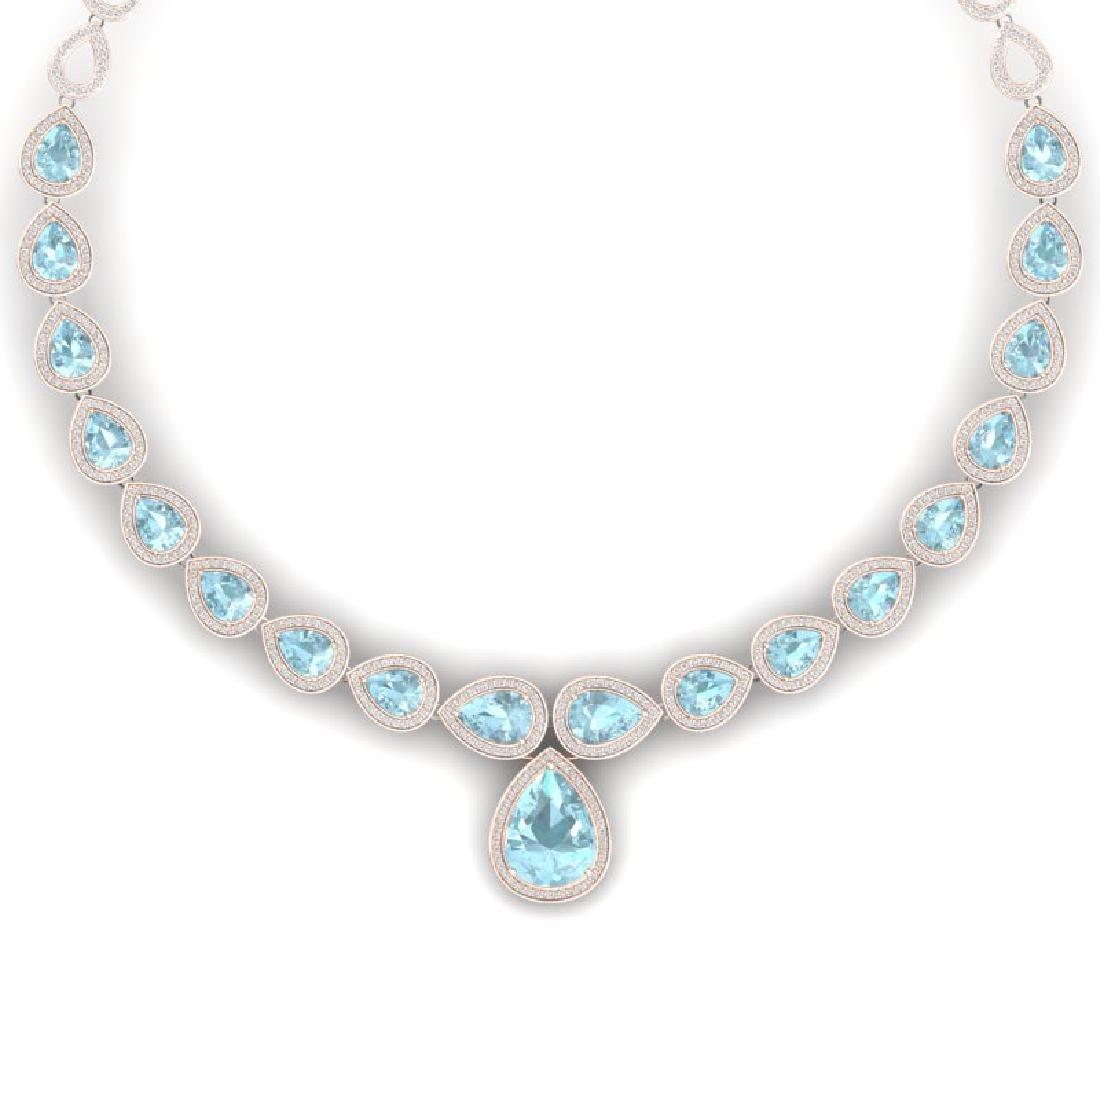 54 CTW Royalty Sky Topaz & VS Diamond Necklace 18K Rose